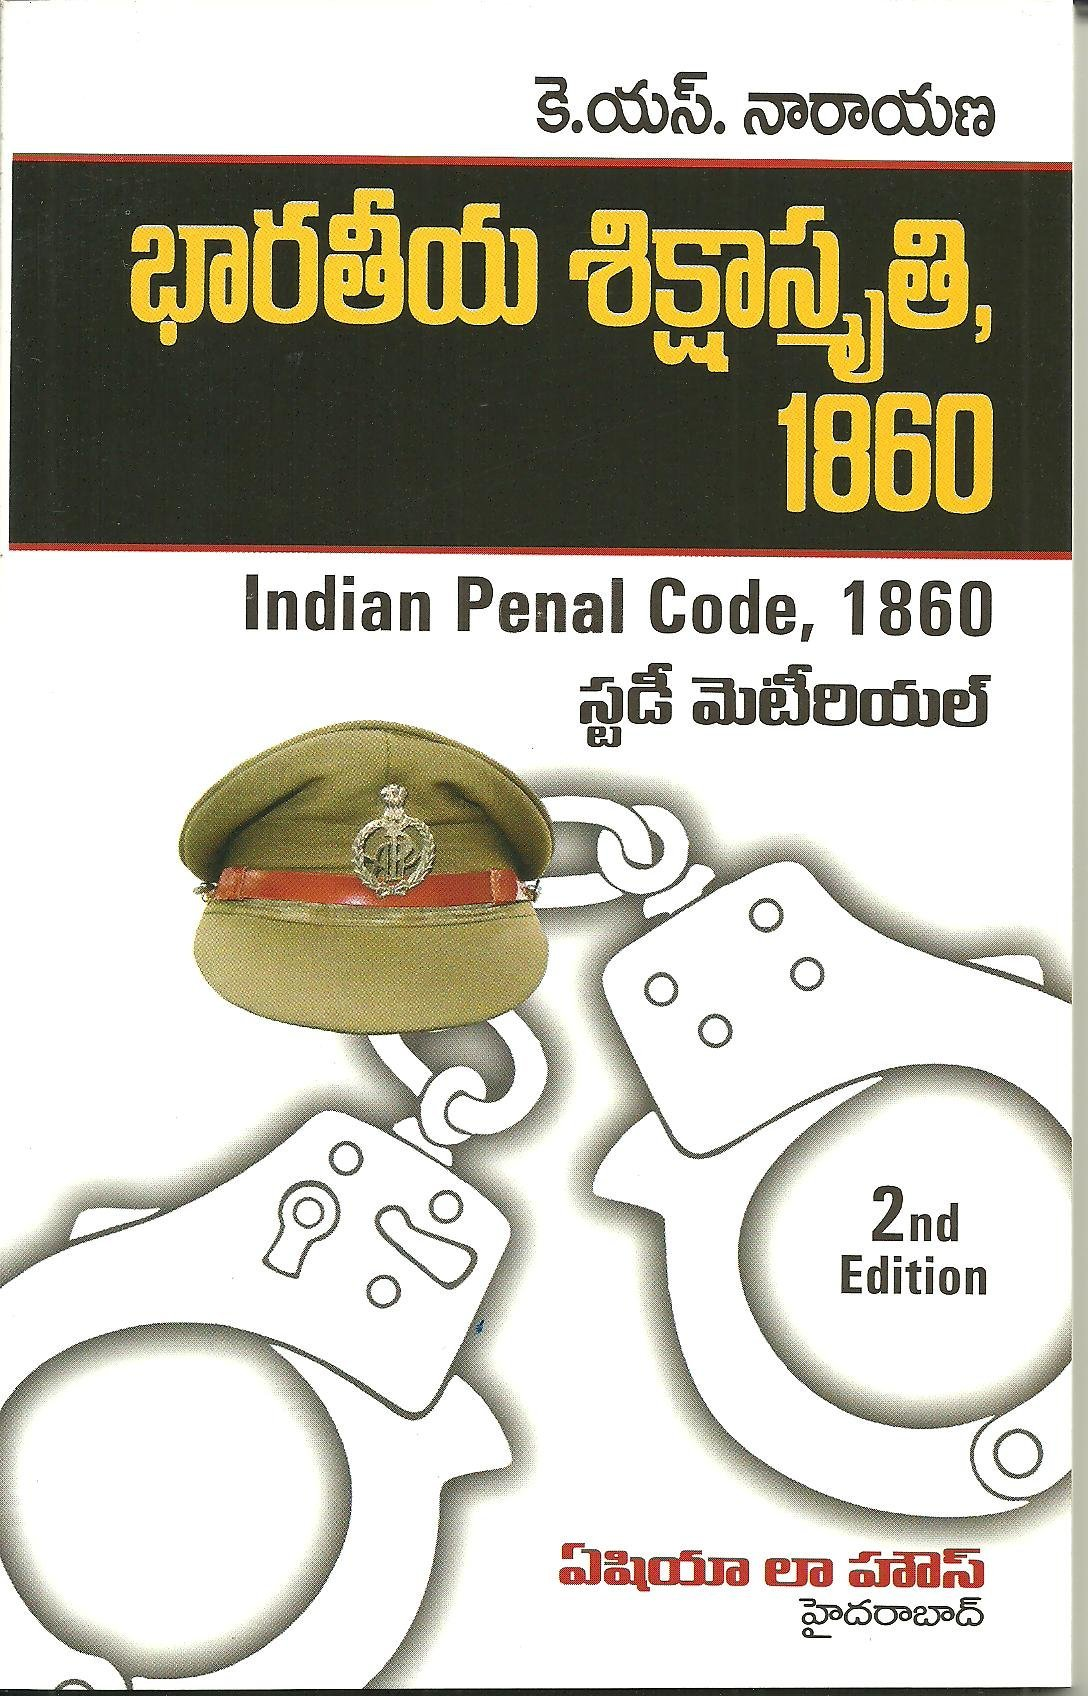 FREE INDIAN PENAL CODE EPUB